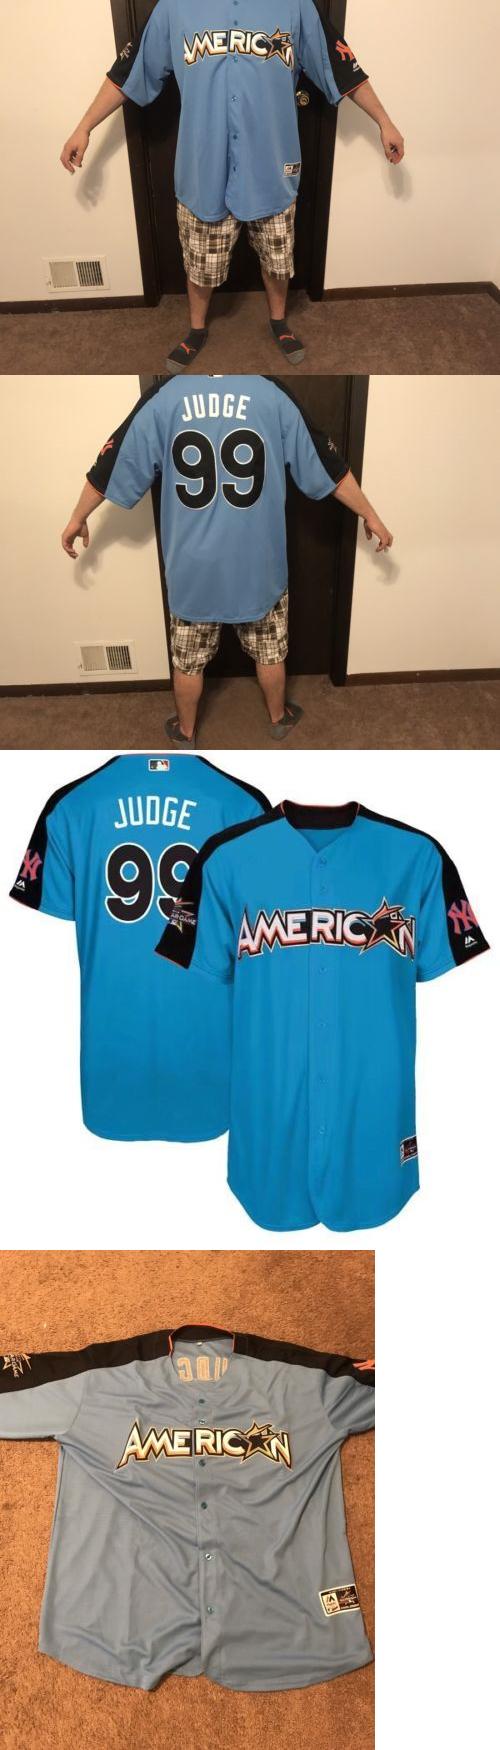 7e25b3f46 ... baseball mlb 24410 all star jersey mlb baseball new york yankees aaron  judge